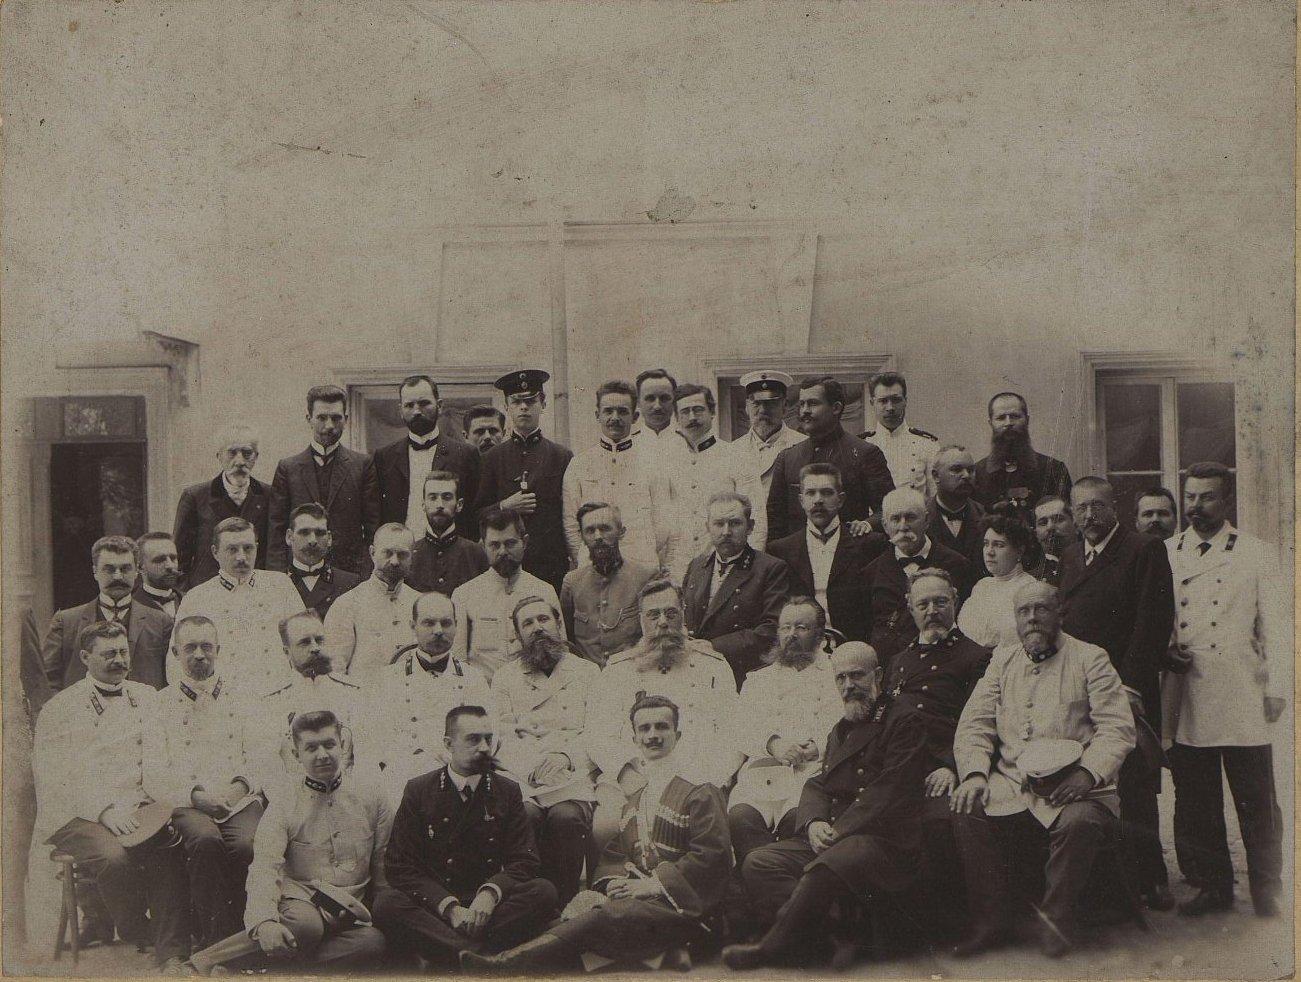 Чиновники Канцелярии Одесского градоначальника. 1906-1907 гг.